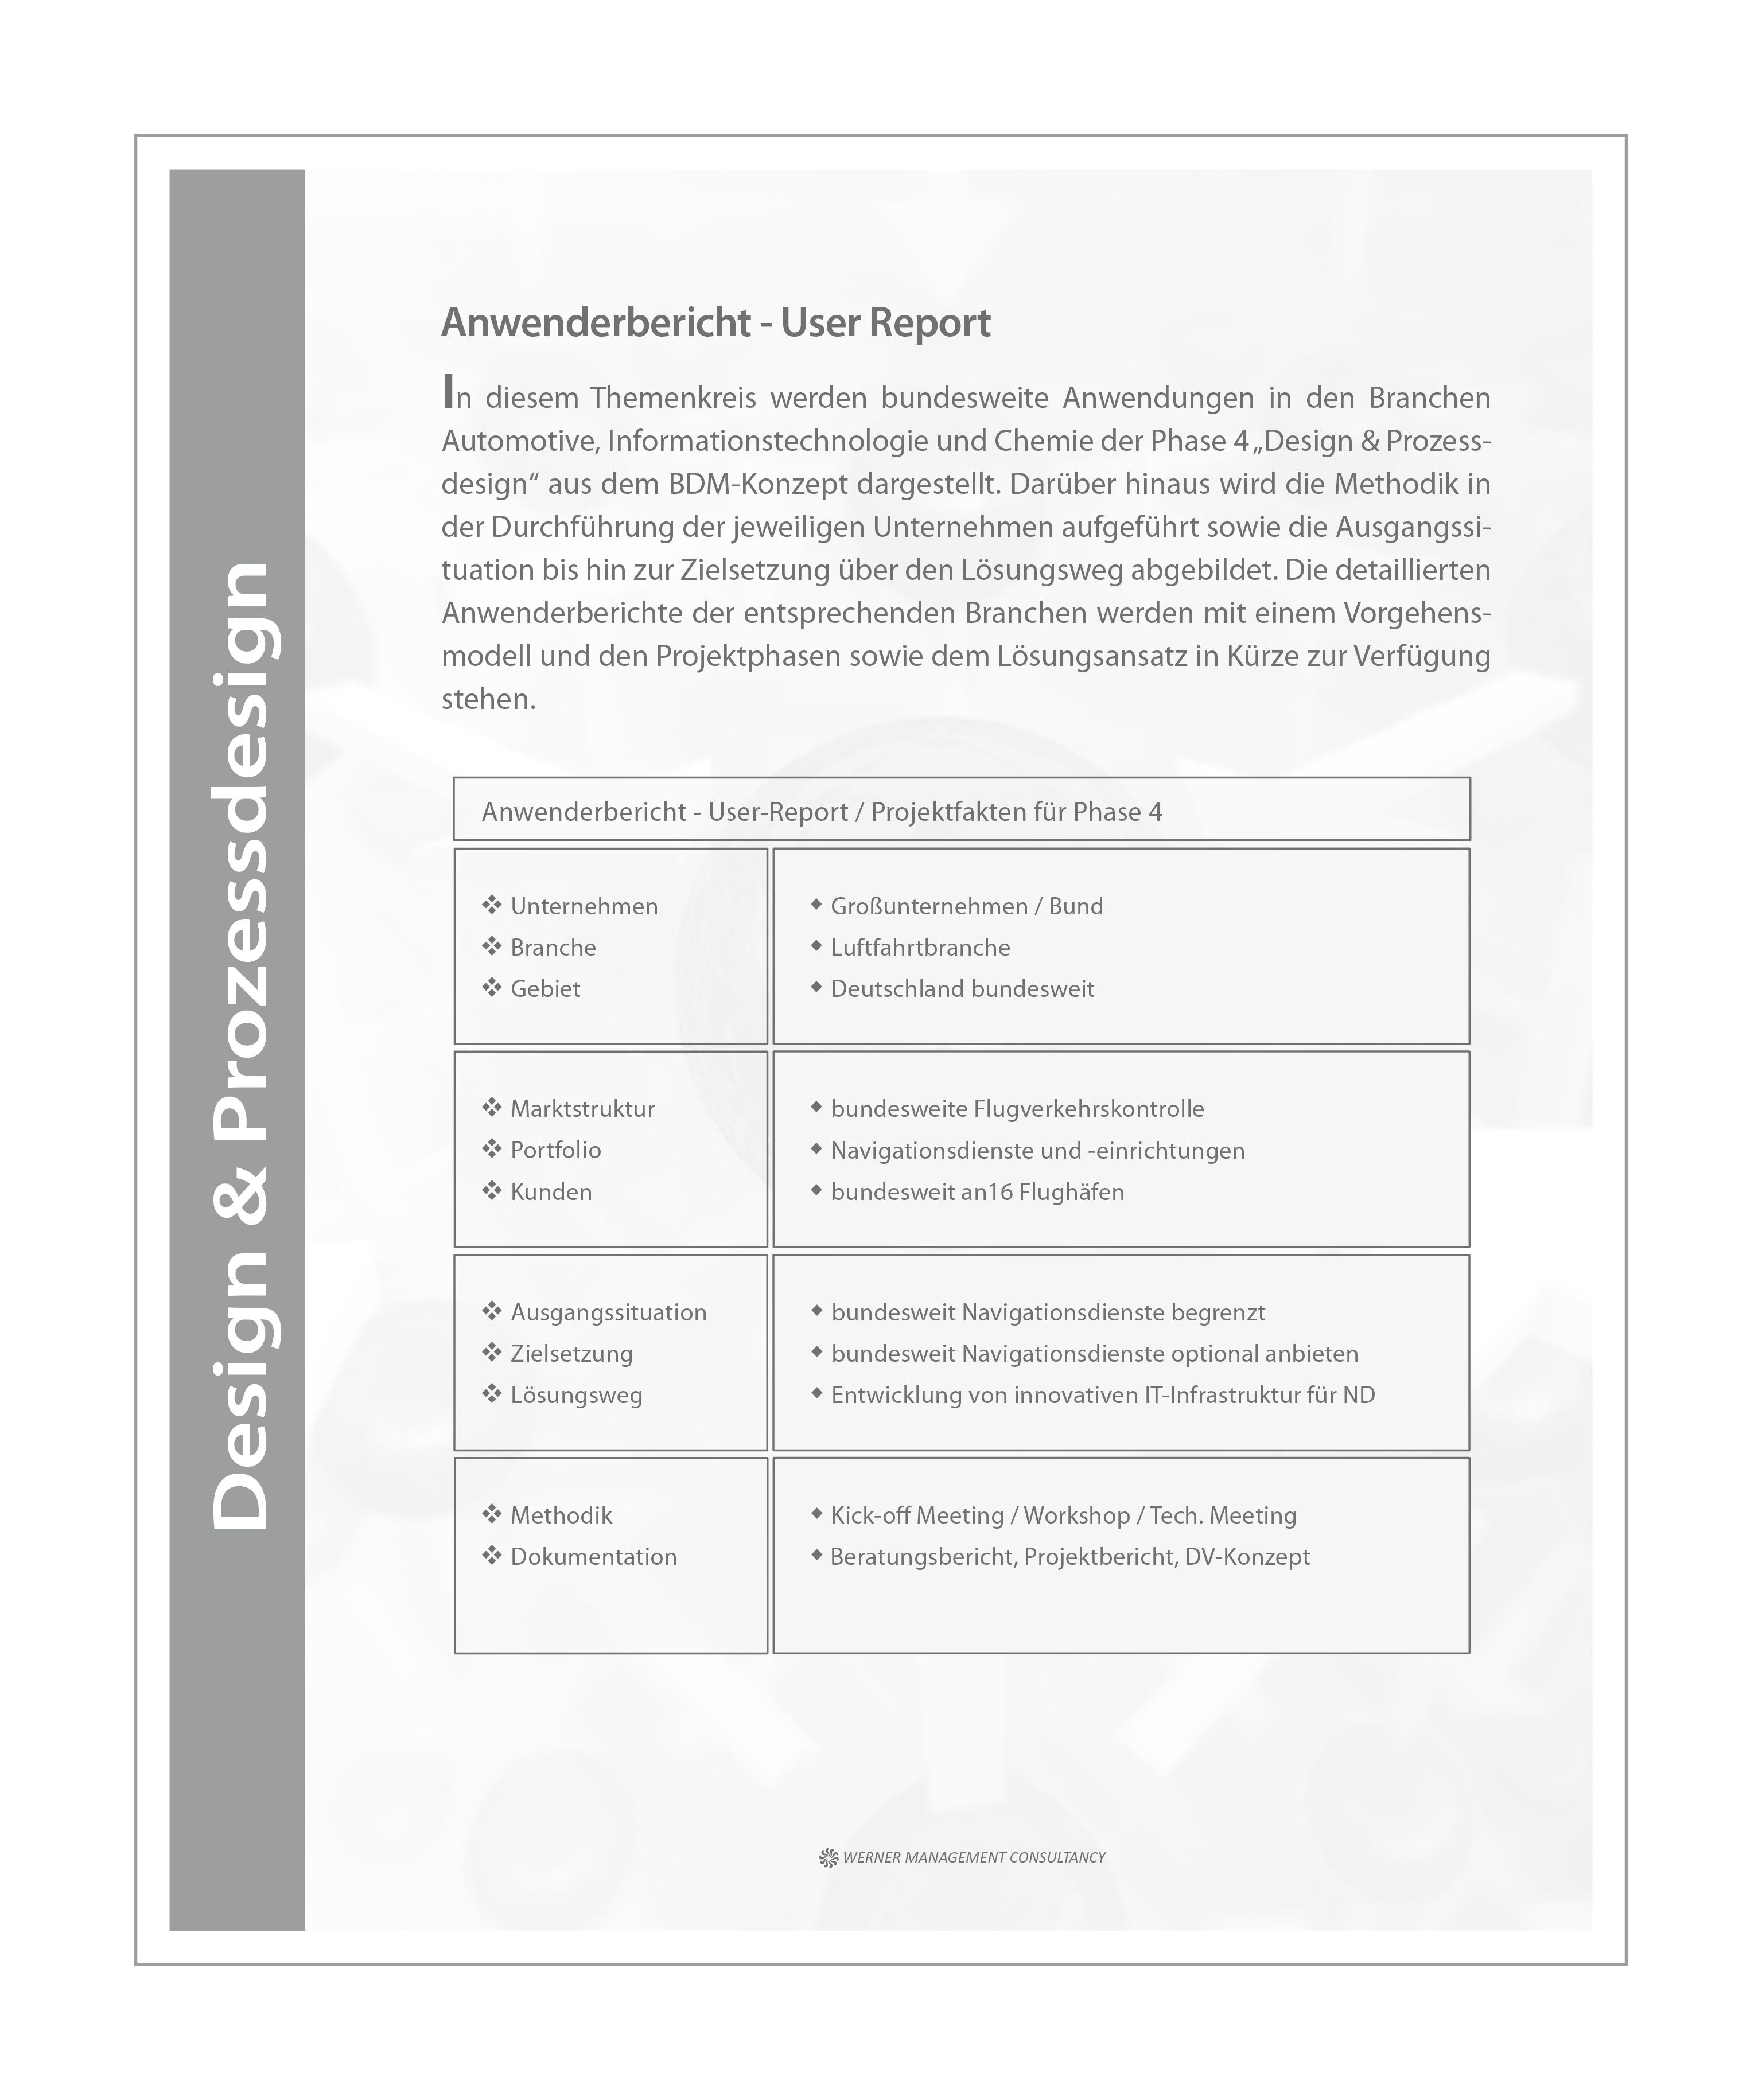 WMC Broschüre Business Development Phase-4 Anwenderbericht